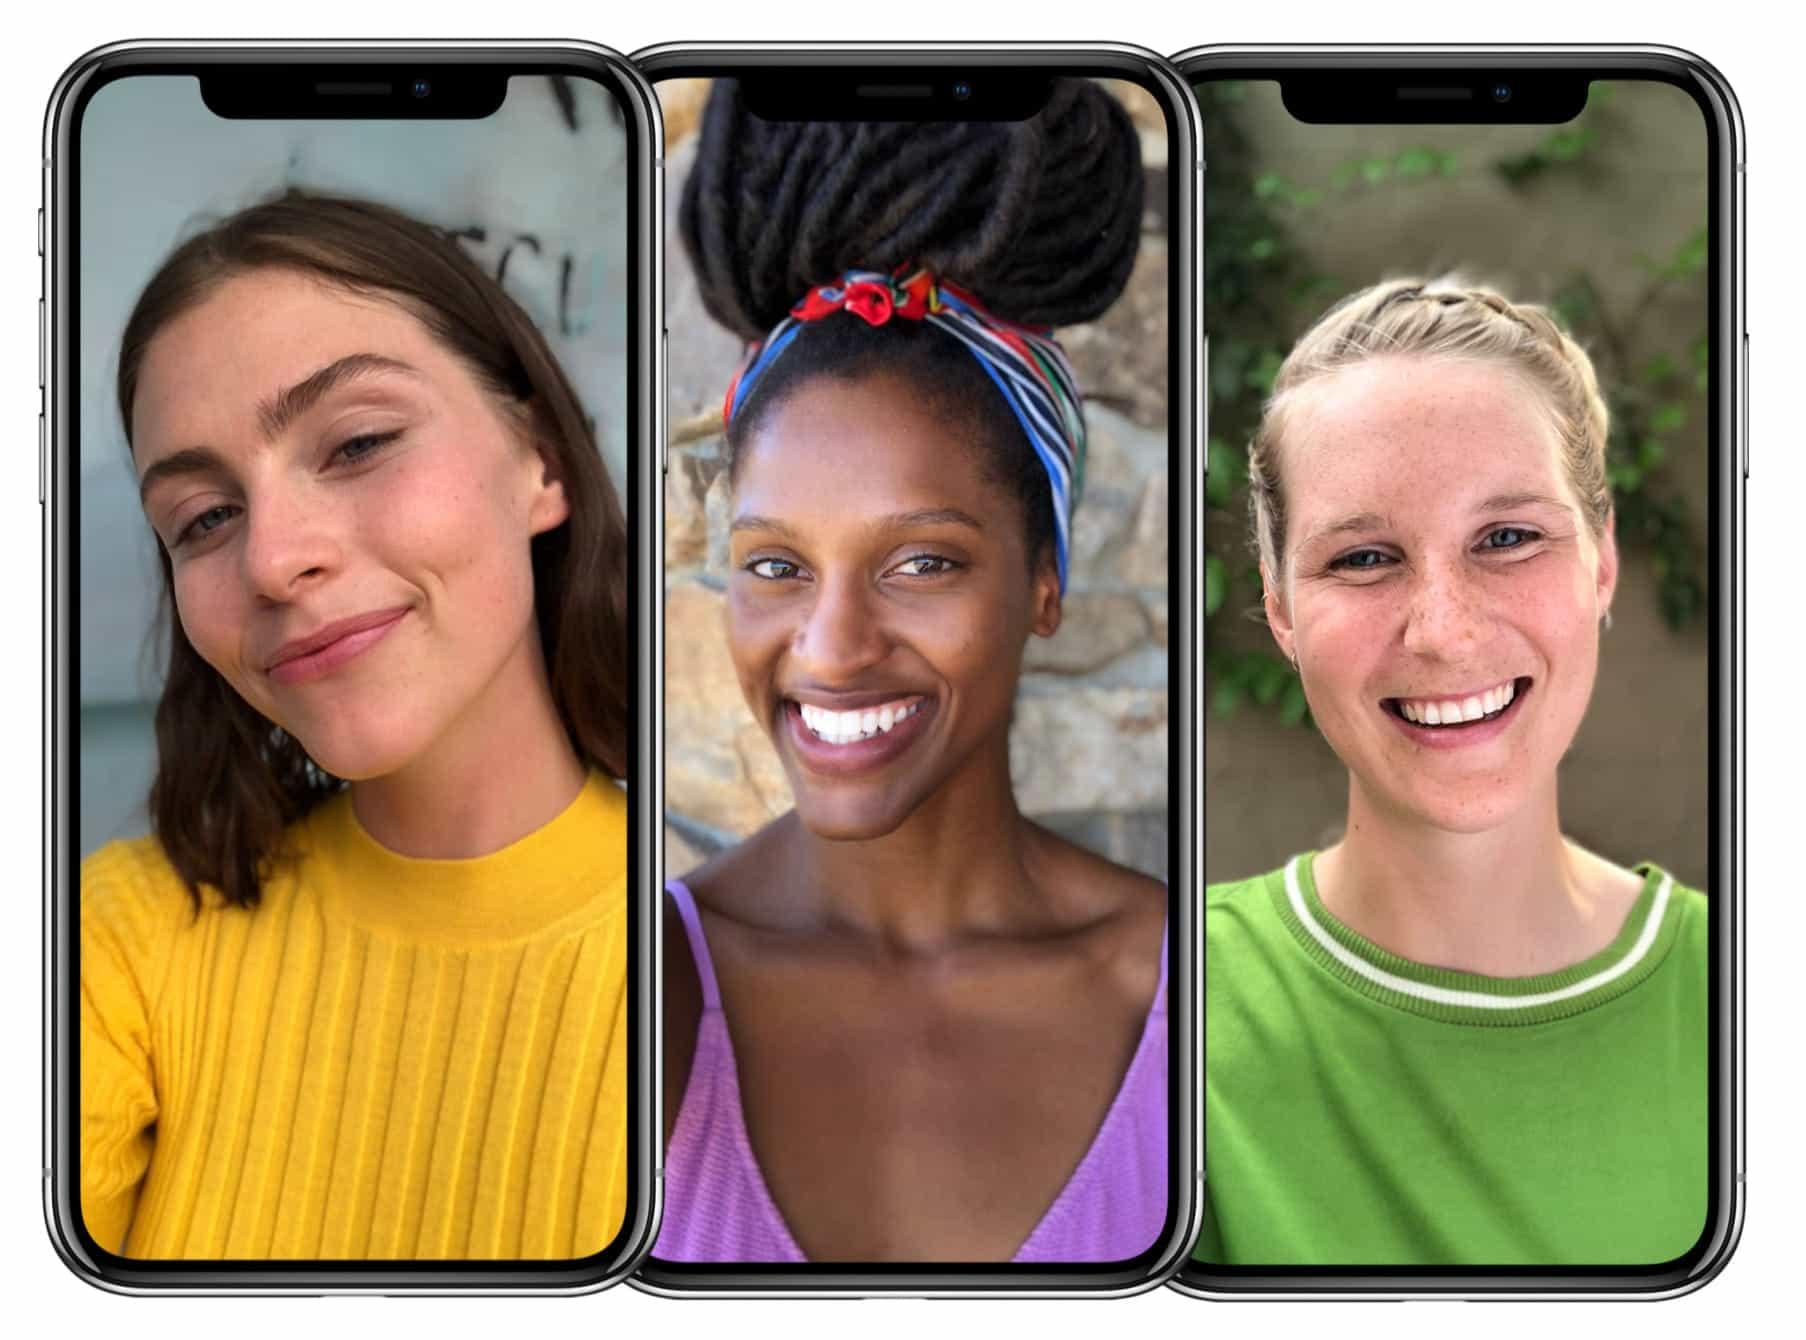 iPhone X Portrait selfies